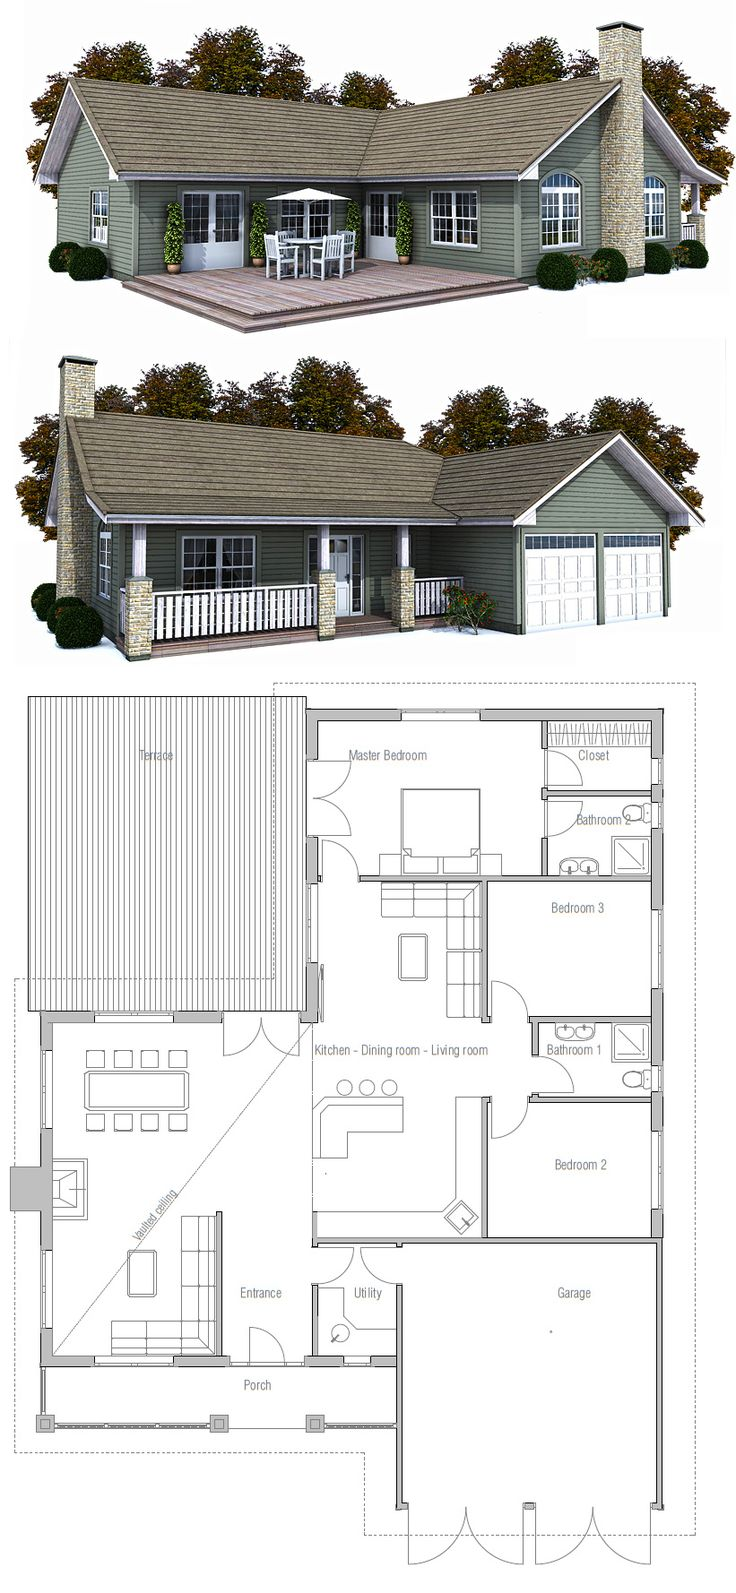 Super 17 Best Ideas About Small House Plans On Pinterest Cabin Plans Largest Home Design Picture Inspirations Pitcheantrous